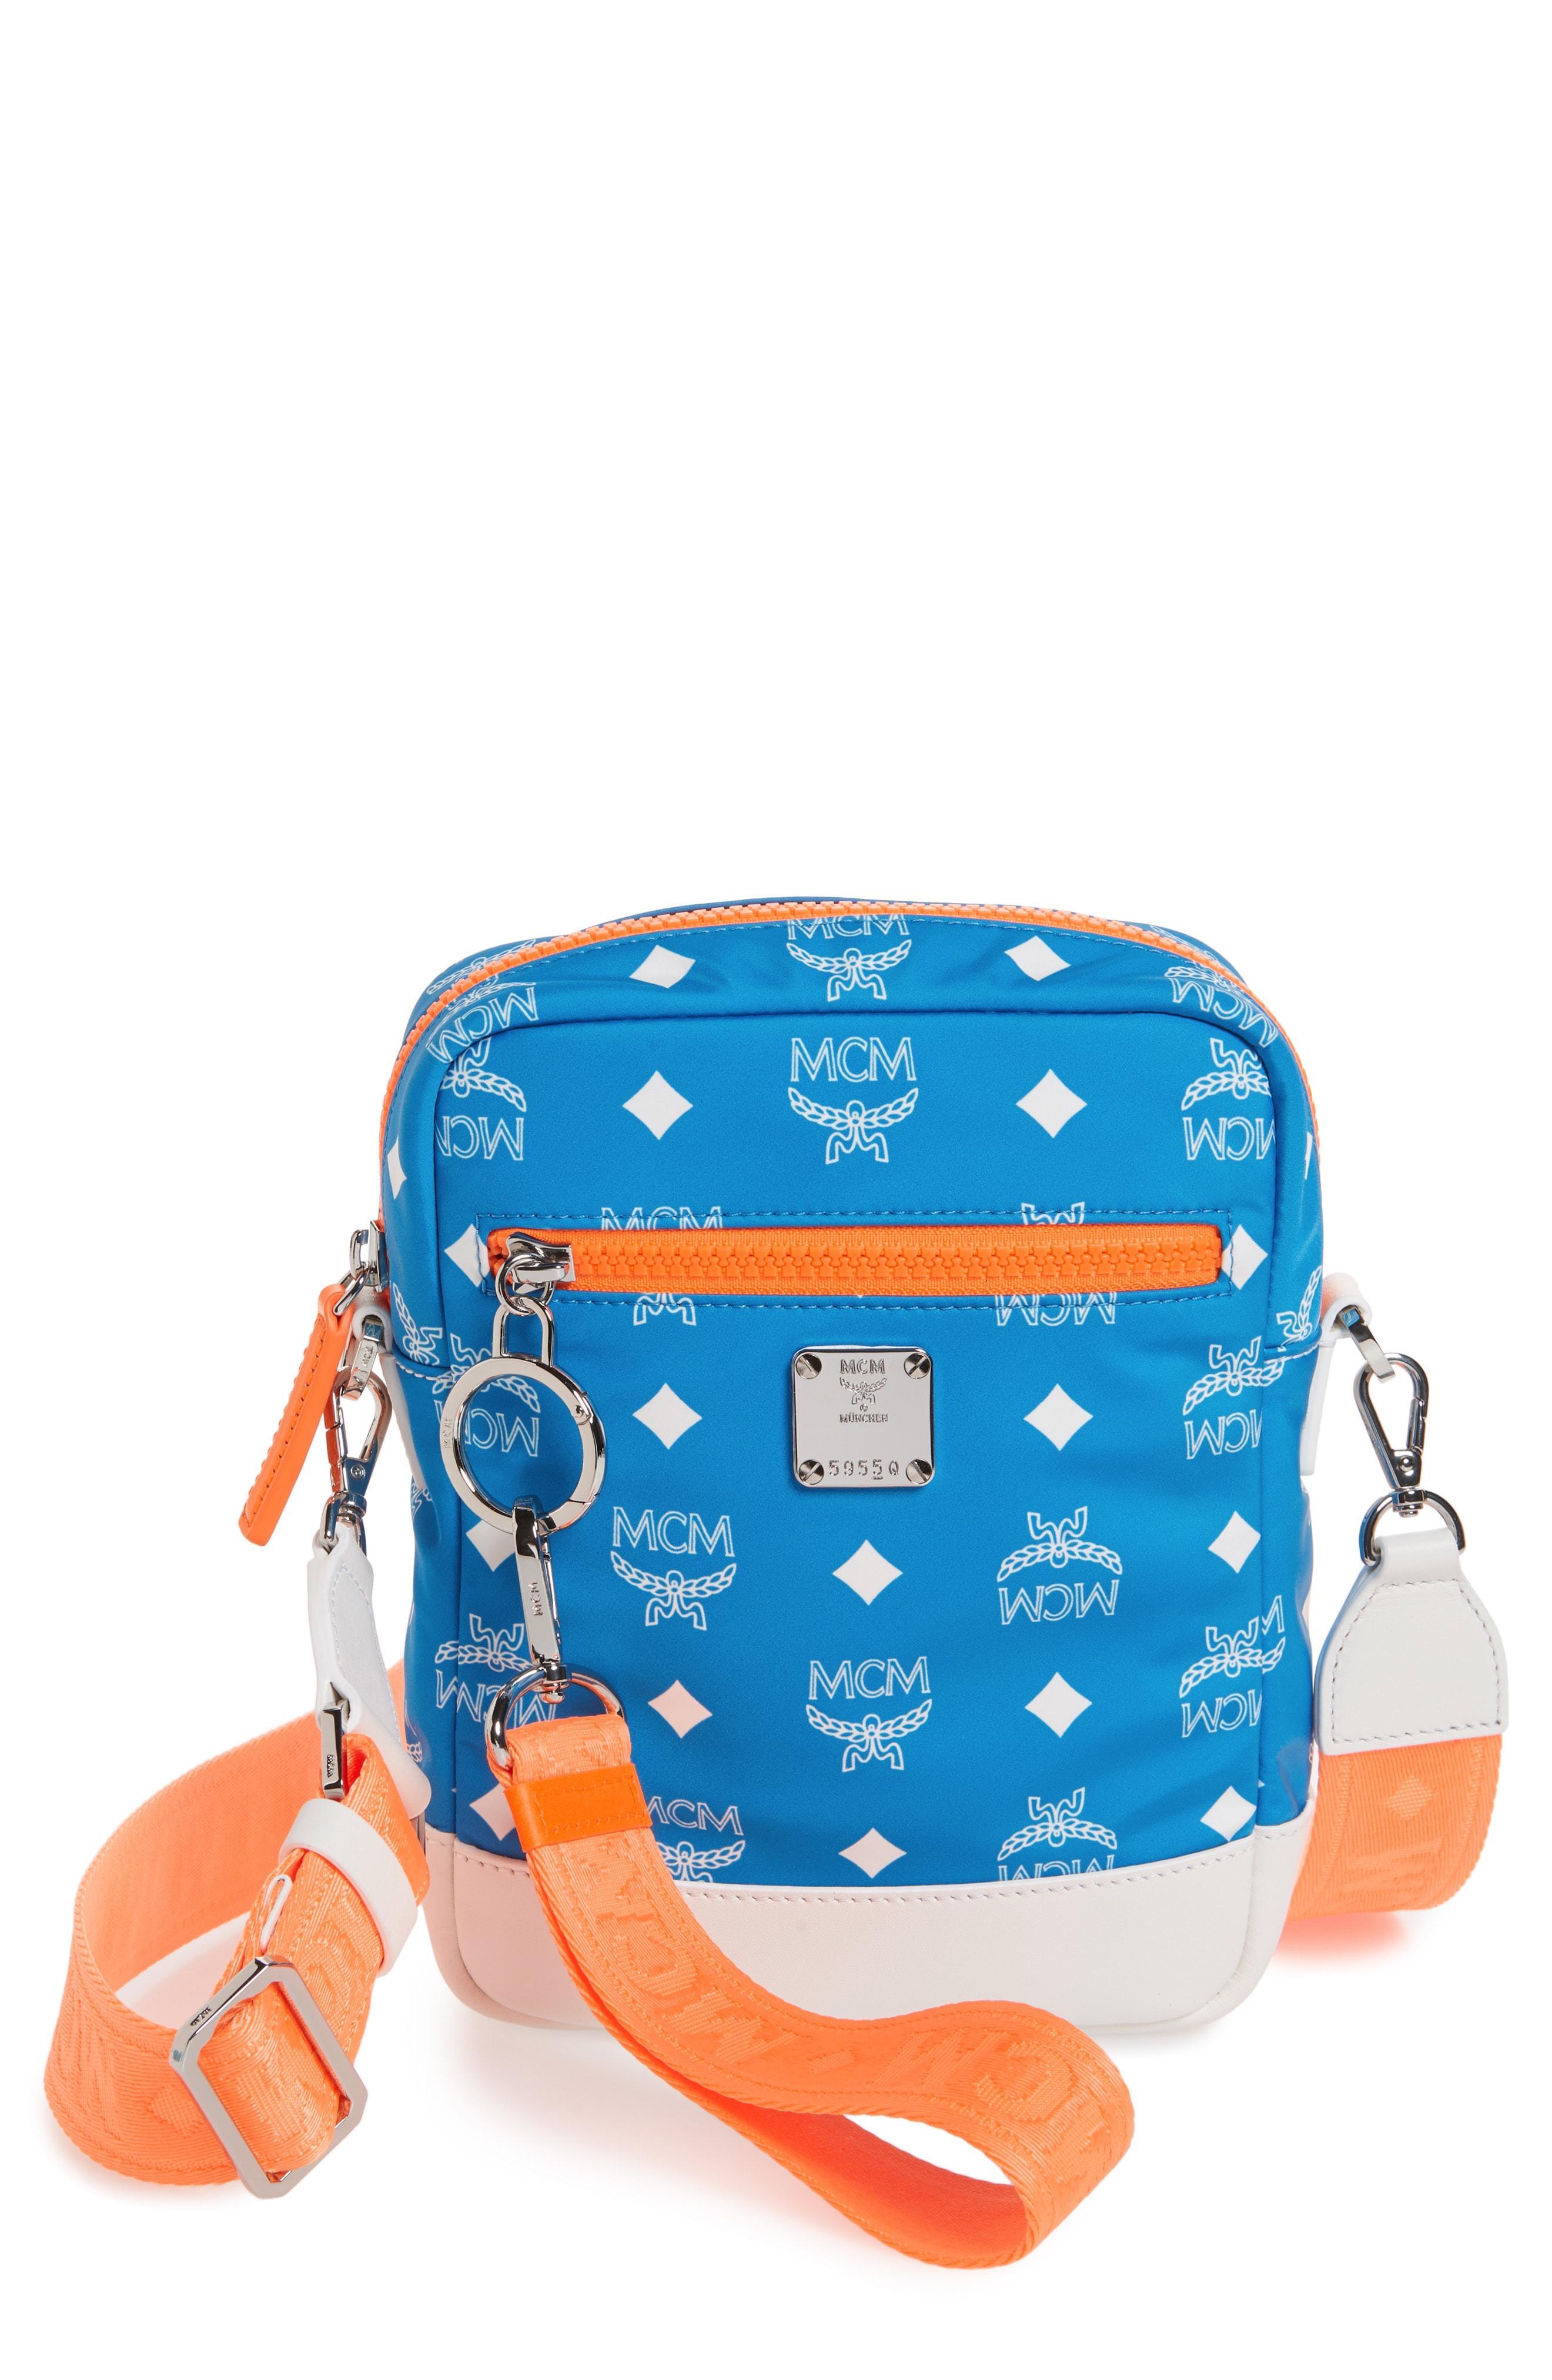 6d71dbf44d8b Men's Blue Resnick Visetos Crossbody Bag